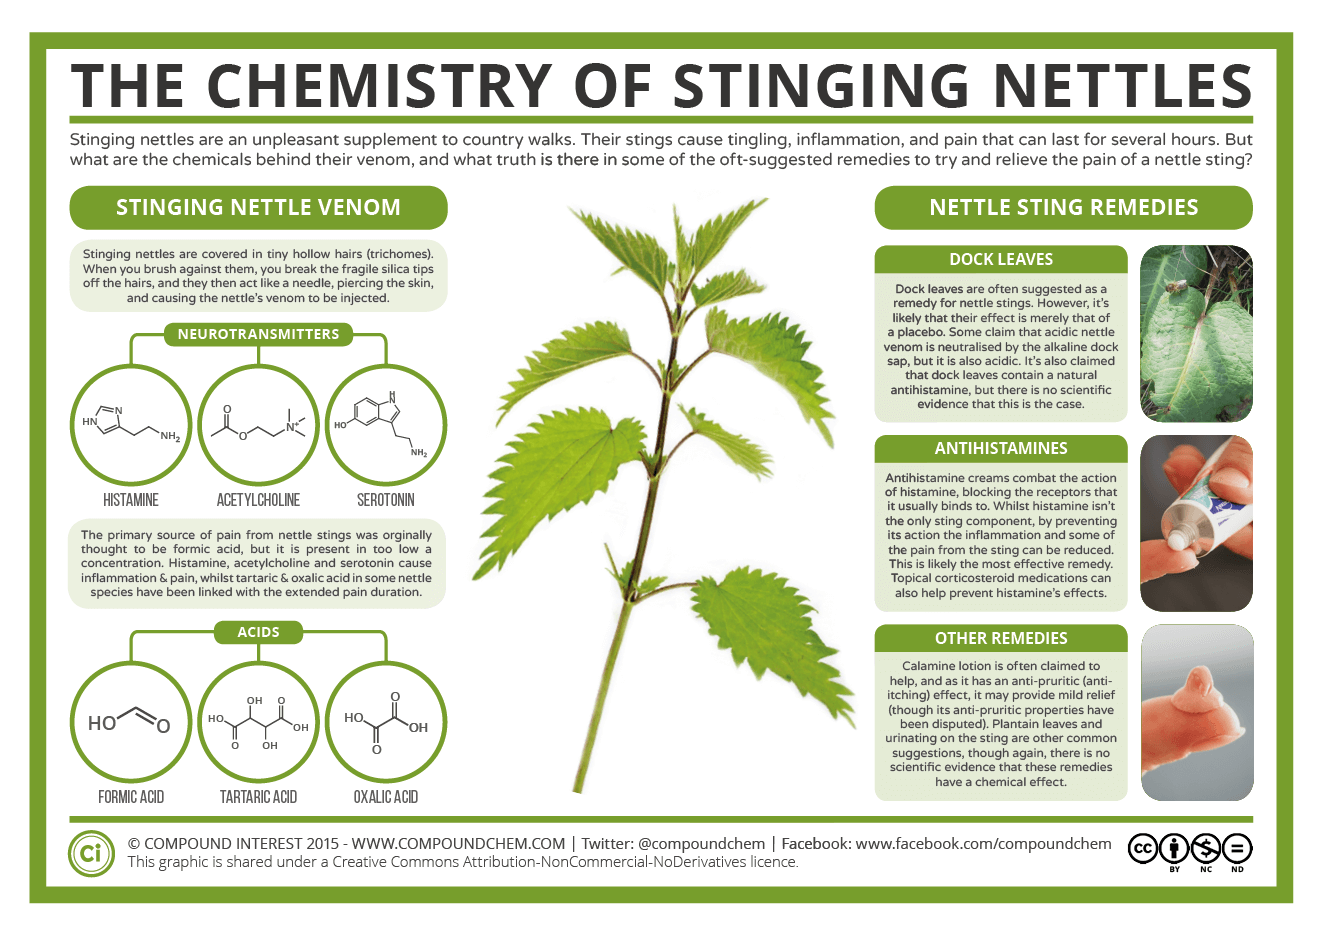 The Chemistry of Stinging Nettles | Chemistry, Science chemistry,  Biochemistry